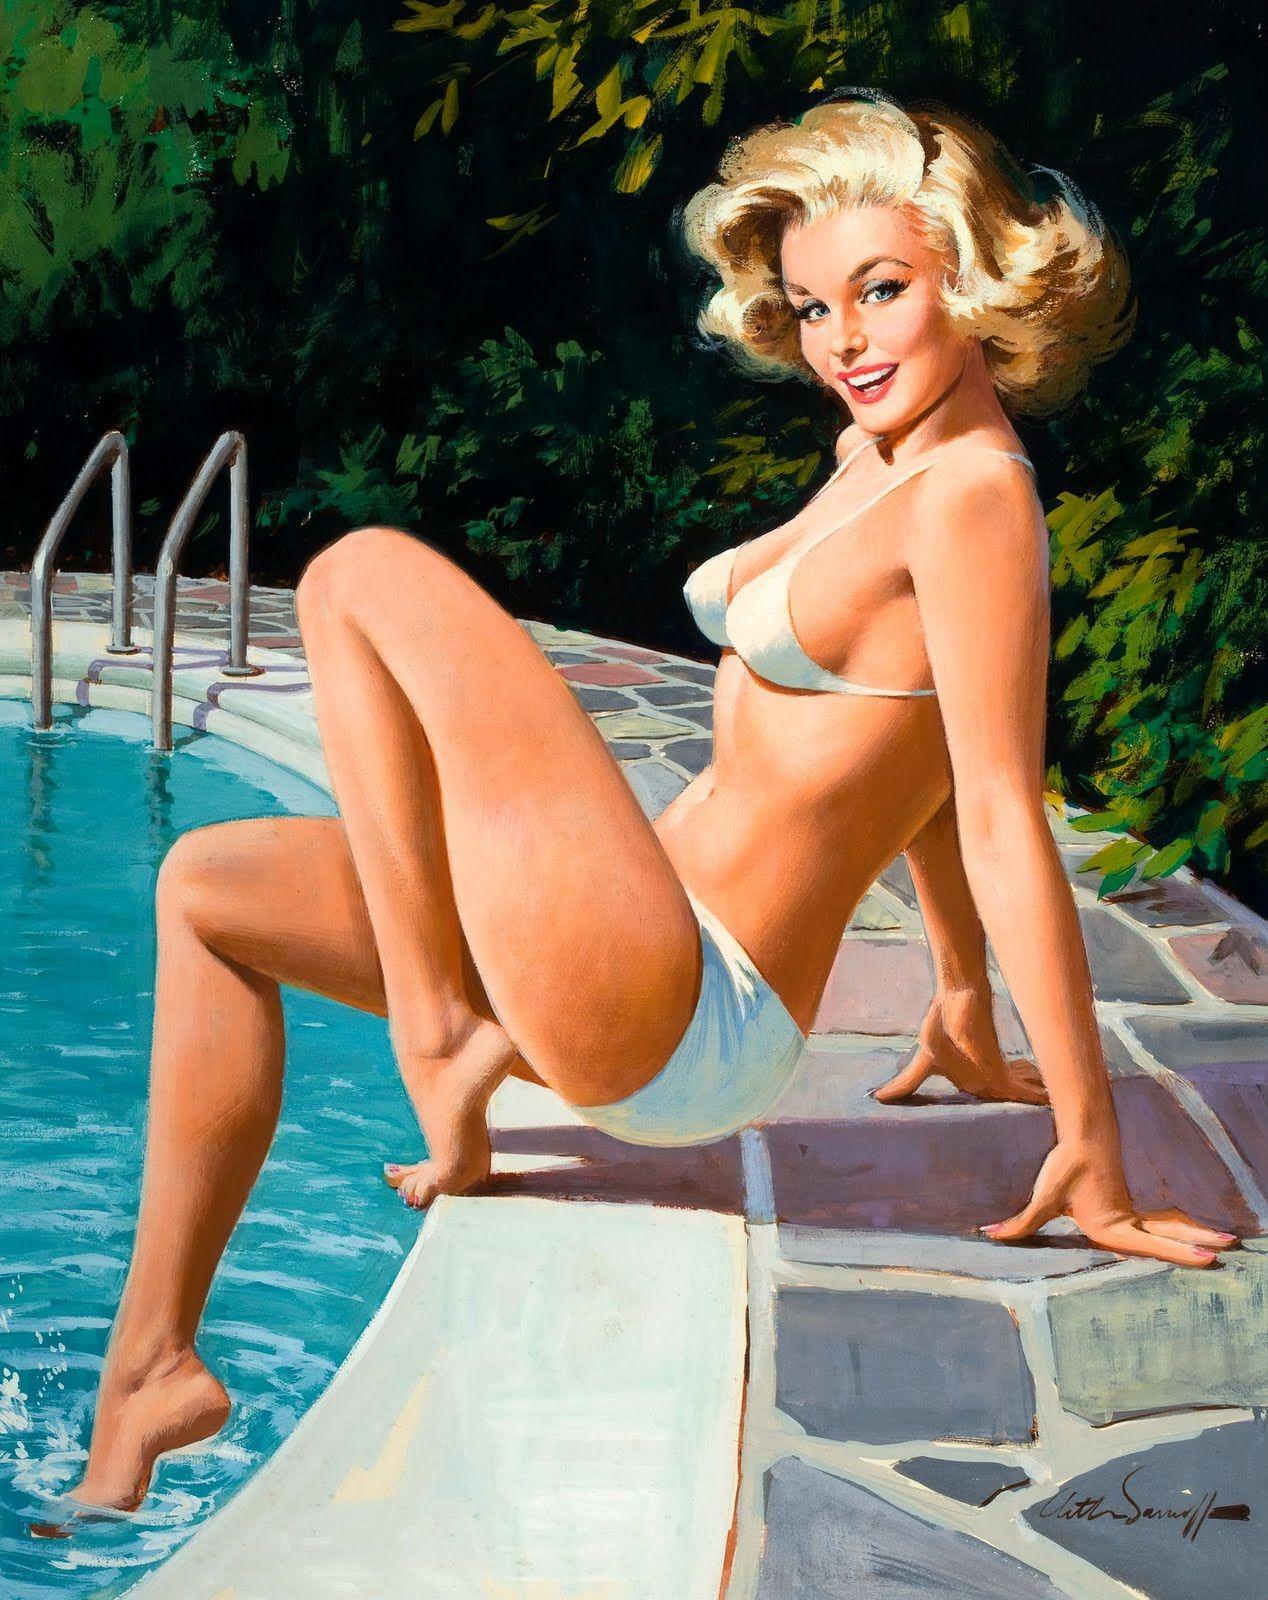 85ff14835 Arthur Saron Sarnoff ~ vintage pin-up girl by the swimming pool ...